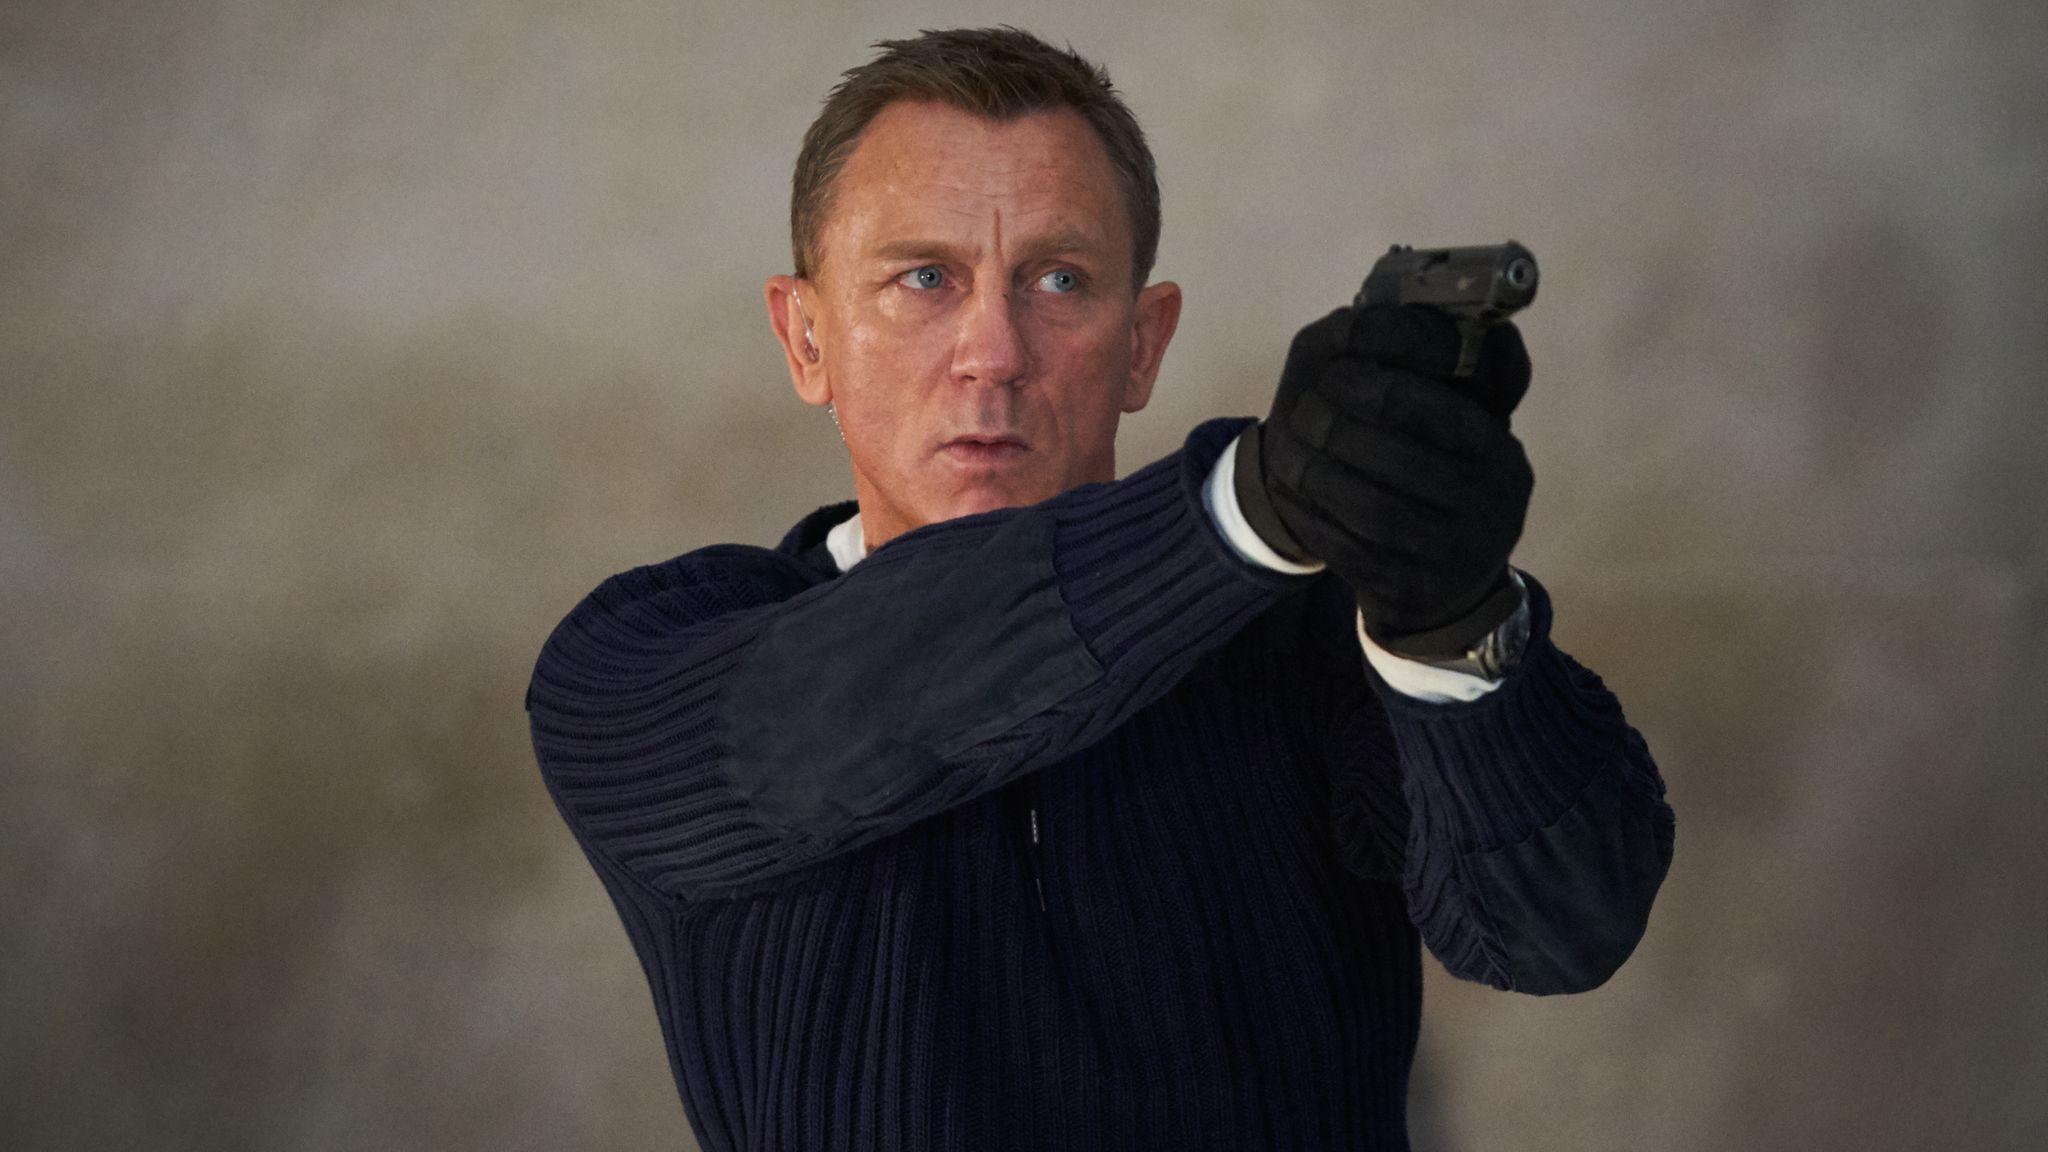 Daniel Craig as James Bond in No Time To Die. Pic: Nicola Dove